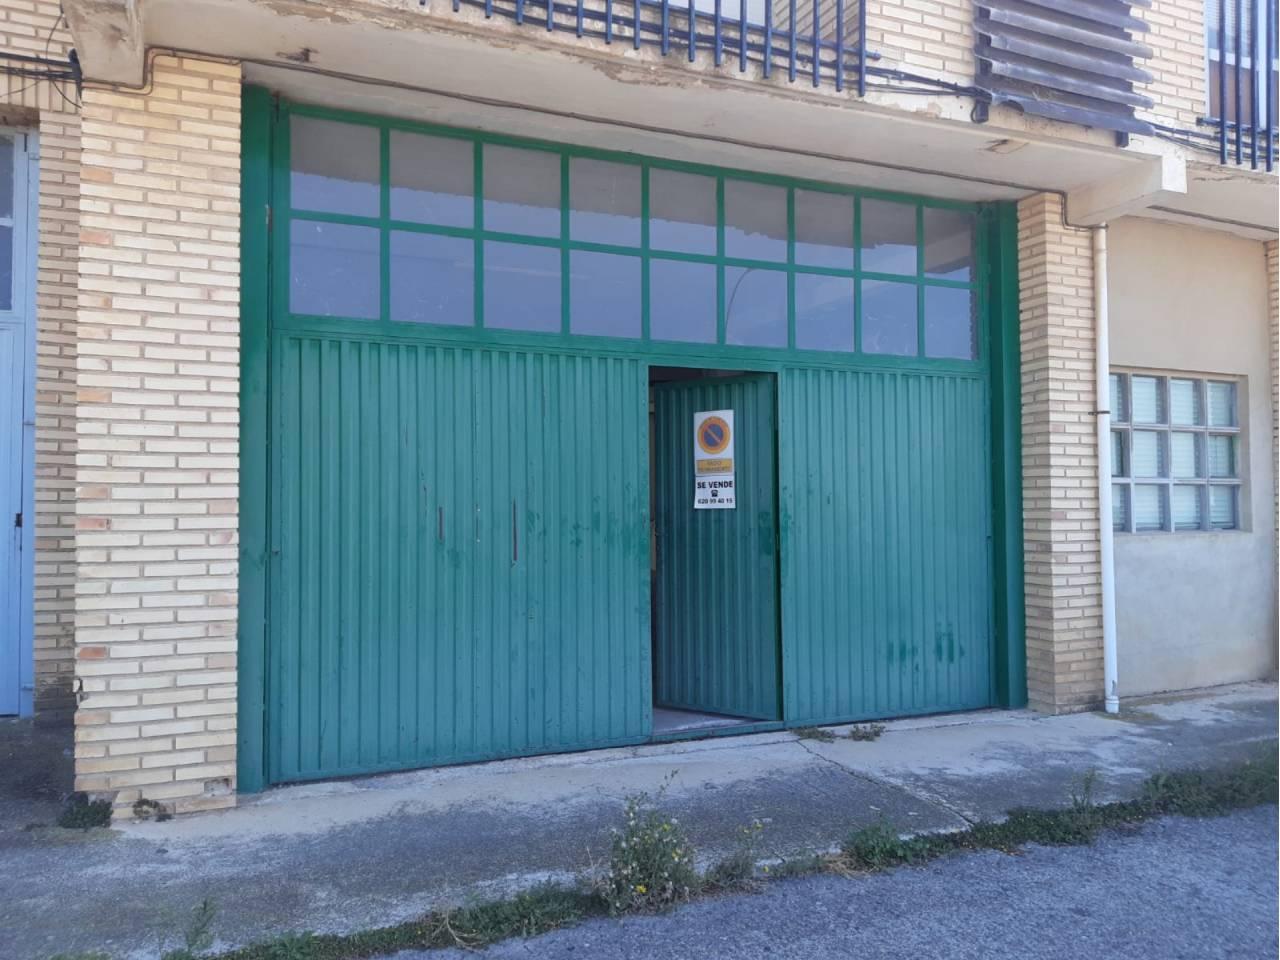 VENTA DE NAVE COMERCIAL EN ALLO, ALLO | REF. (004229)